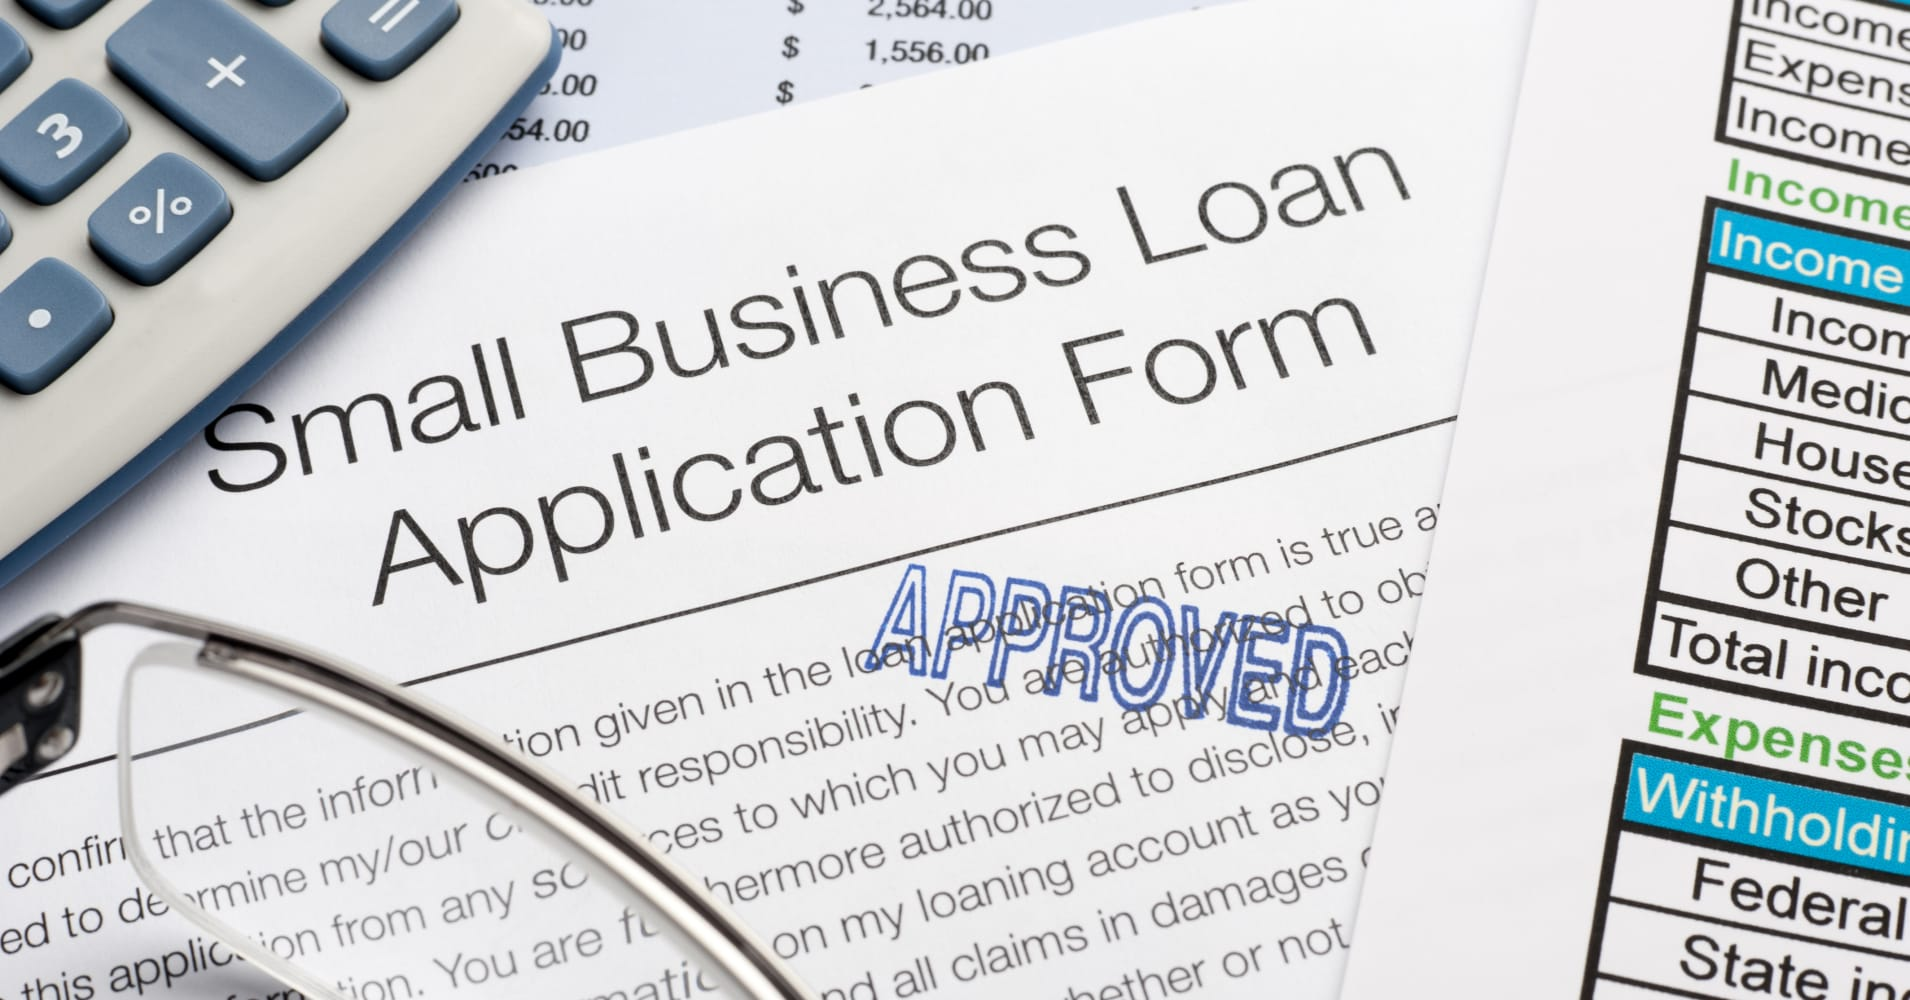 Loan payday bad credit image 5